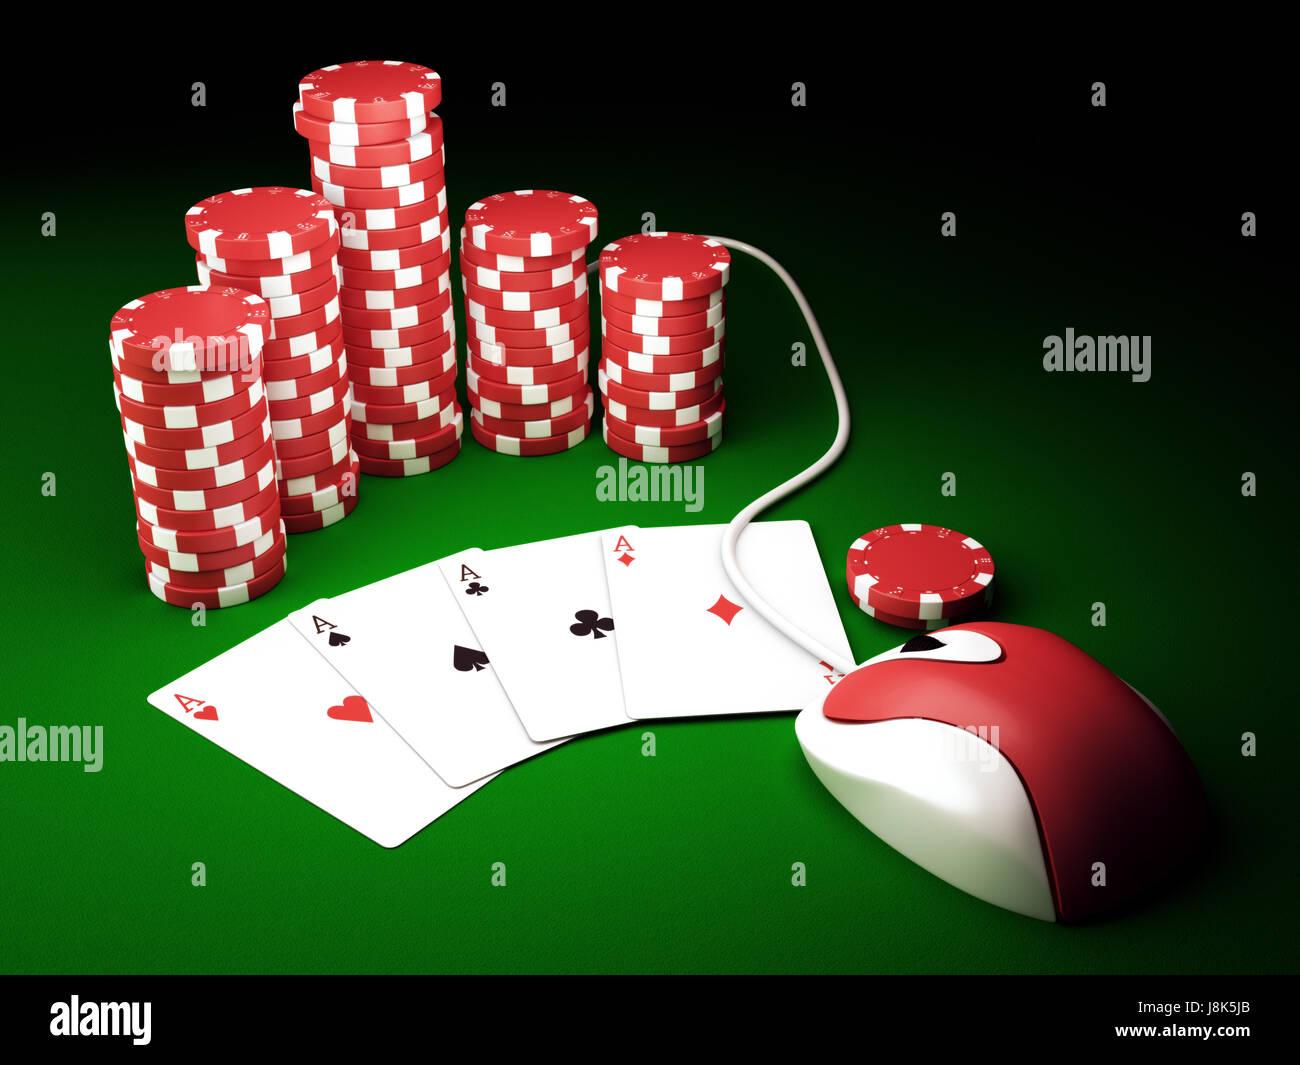 Www online casino las vegas, Goldfish casino slots problems